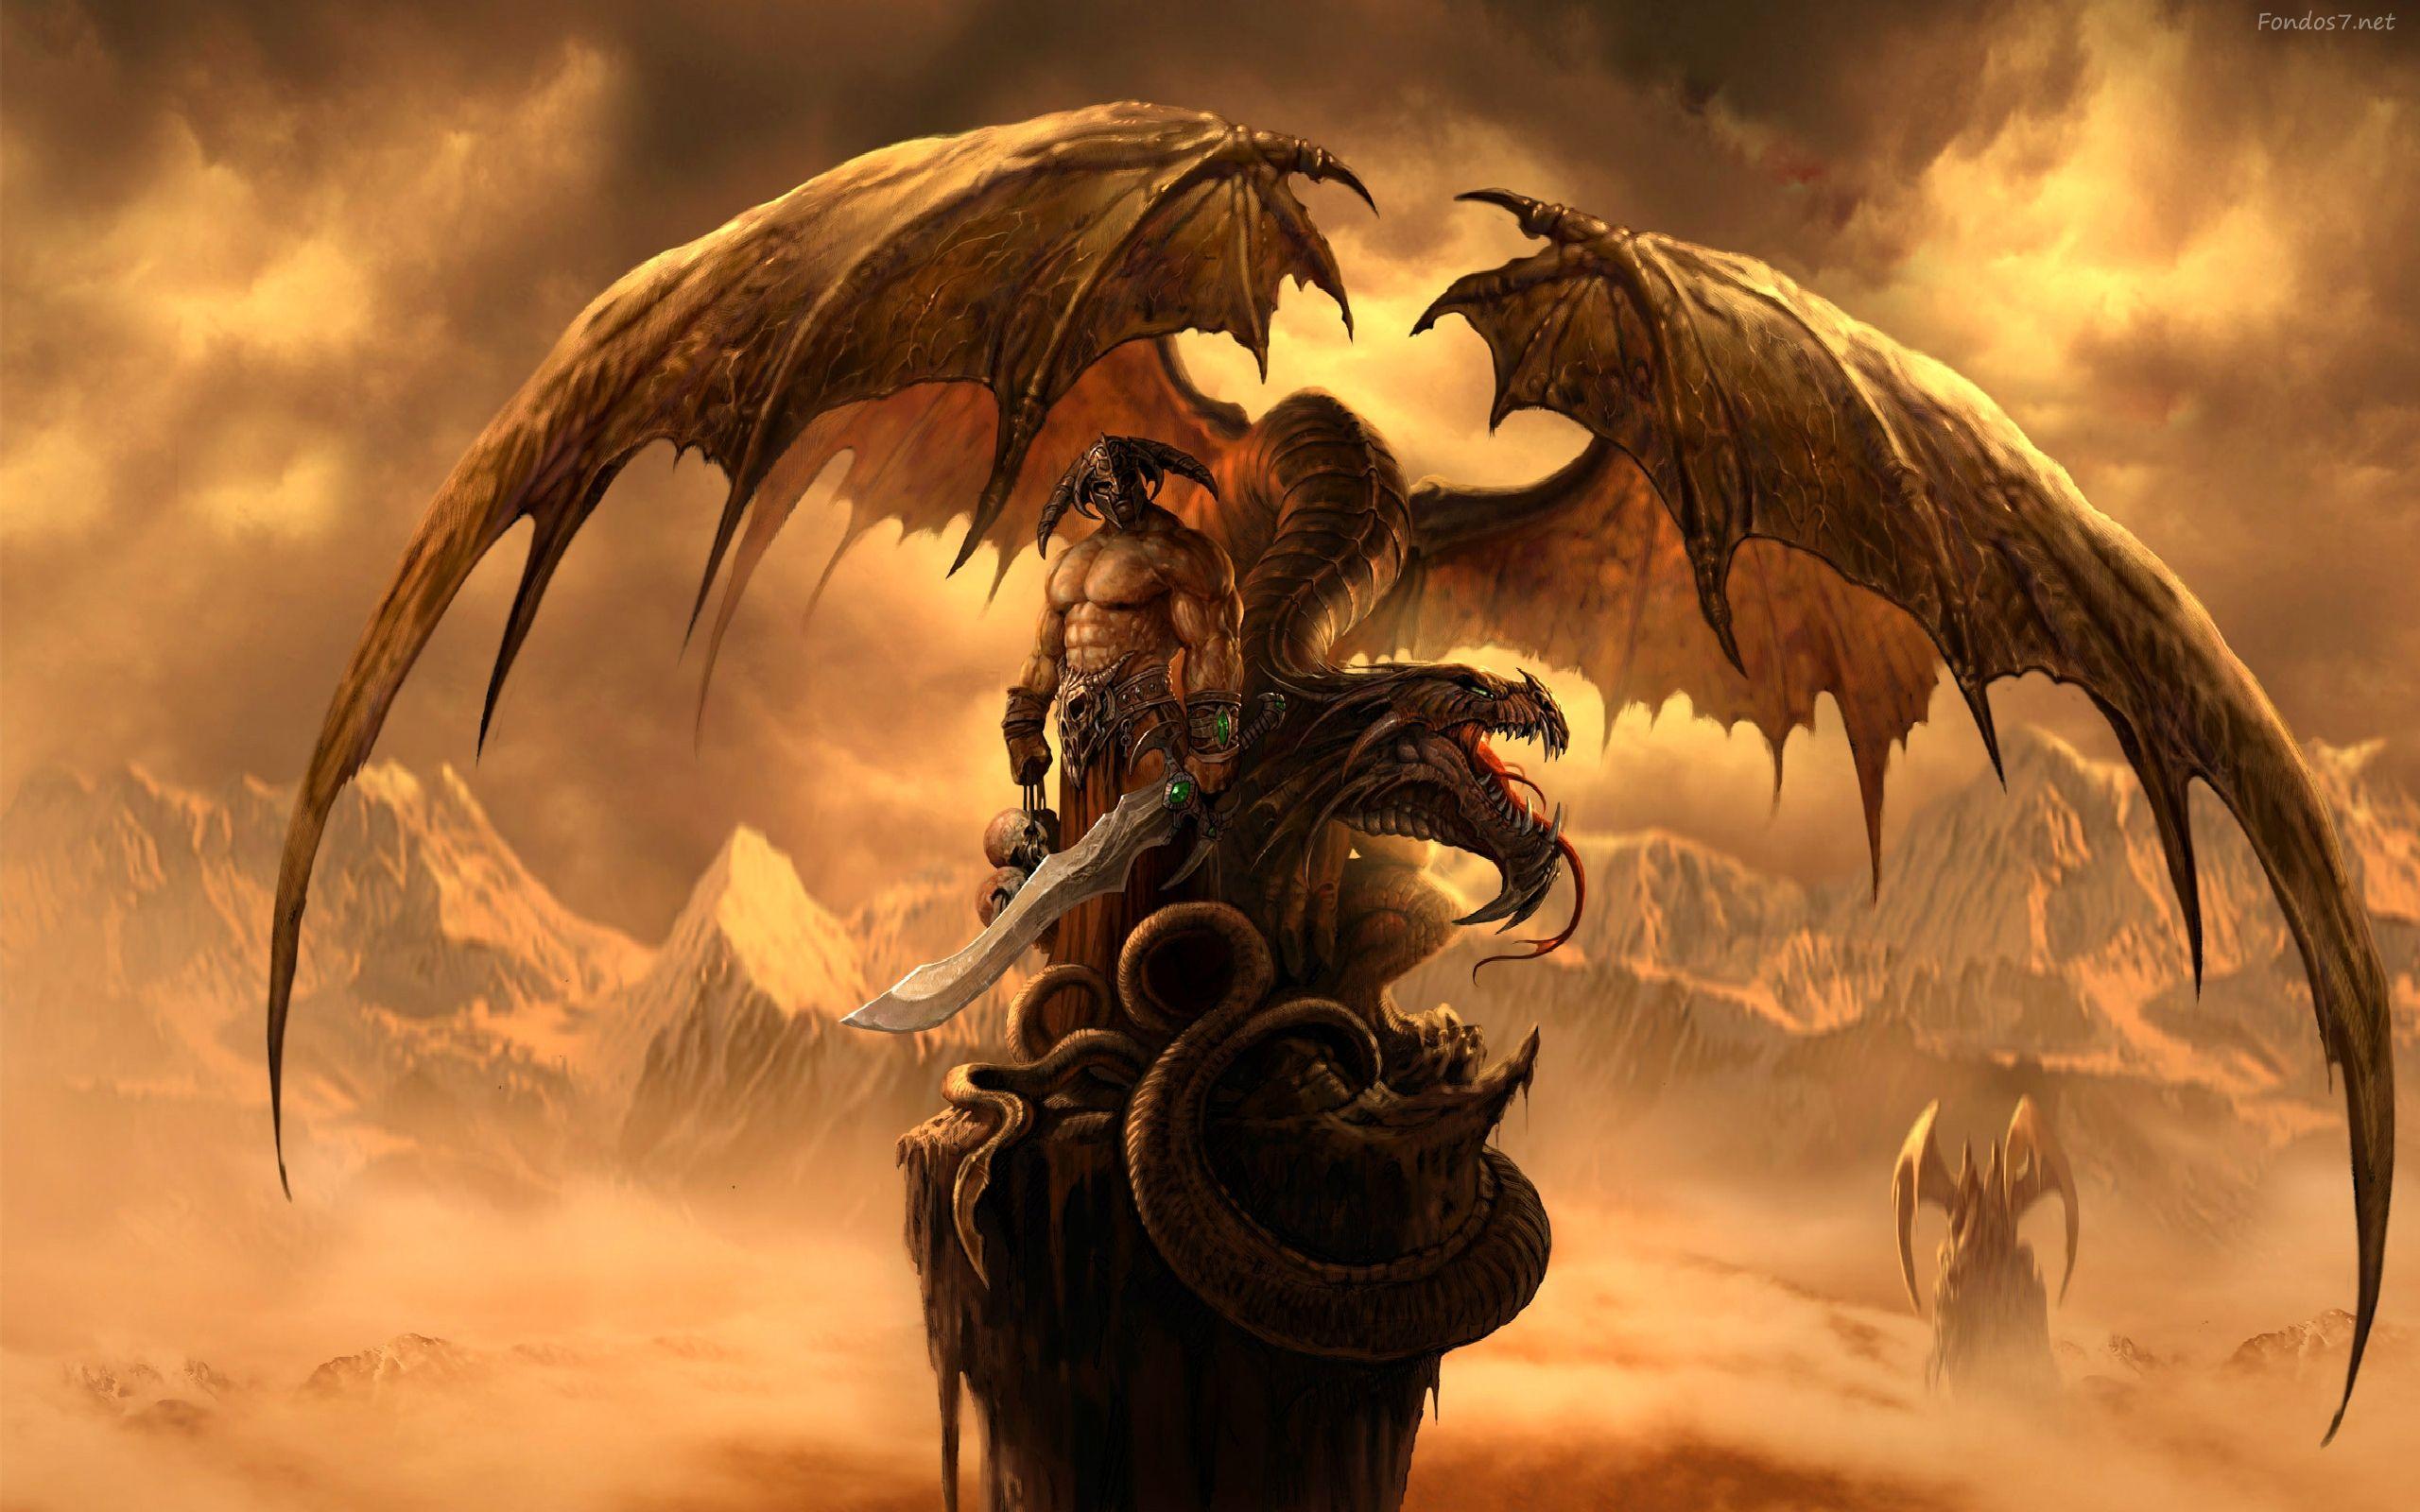 Nature Angeles Y Demonios Hd Dragones Chinos Im Genes Mil 2560x1600